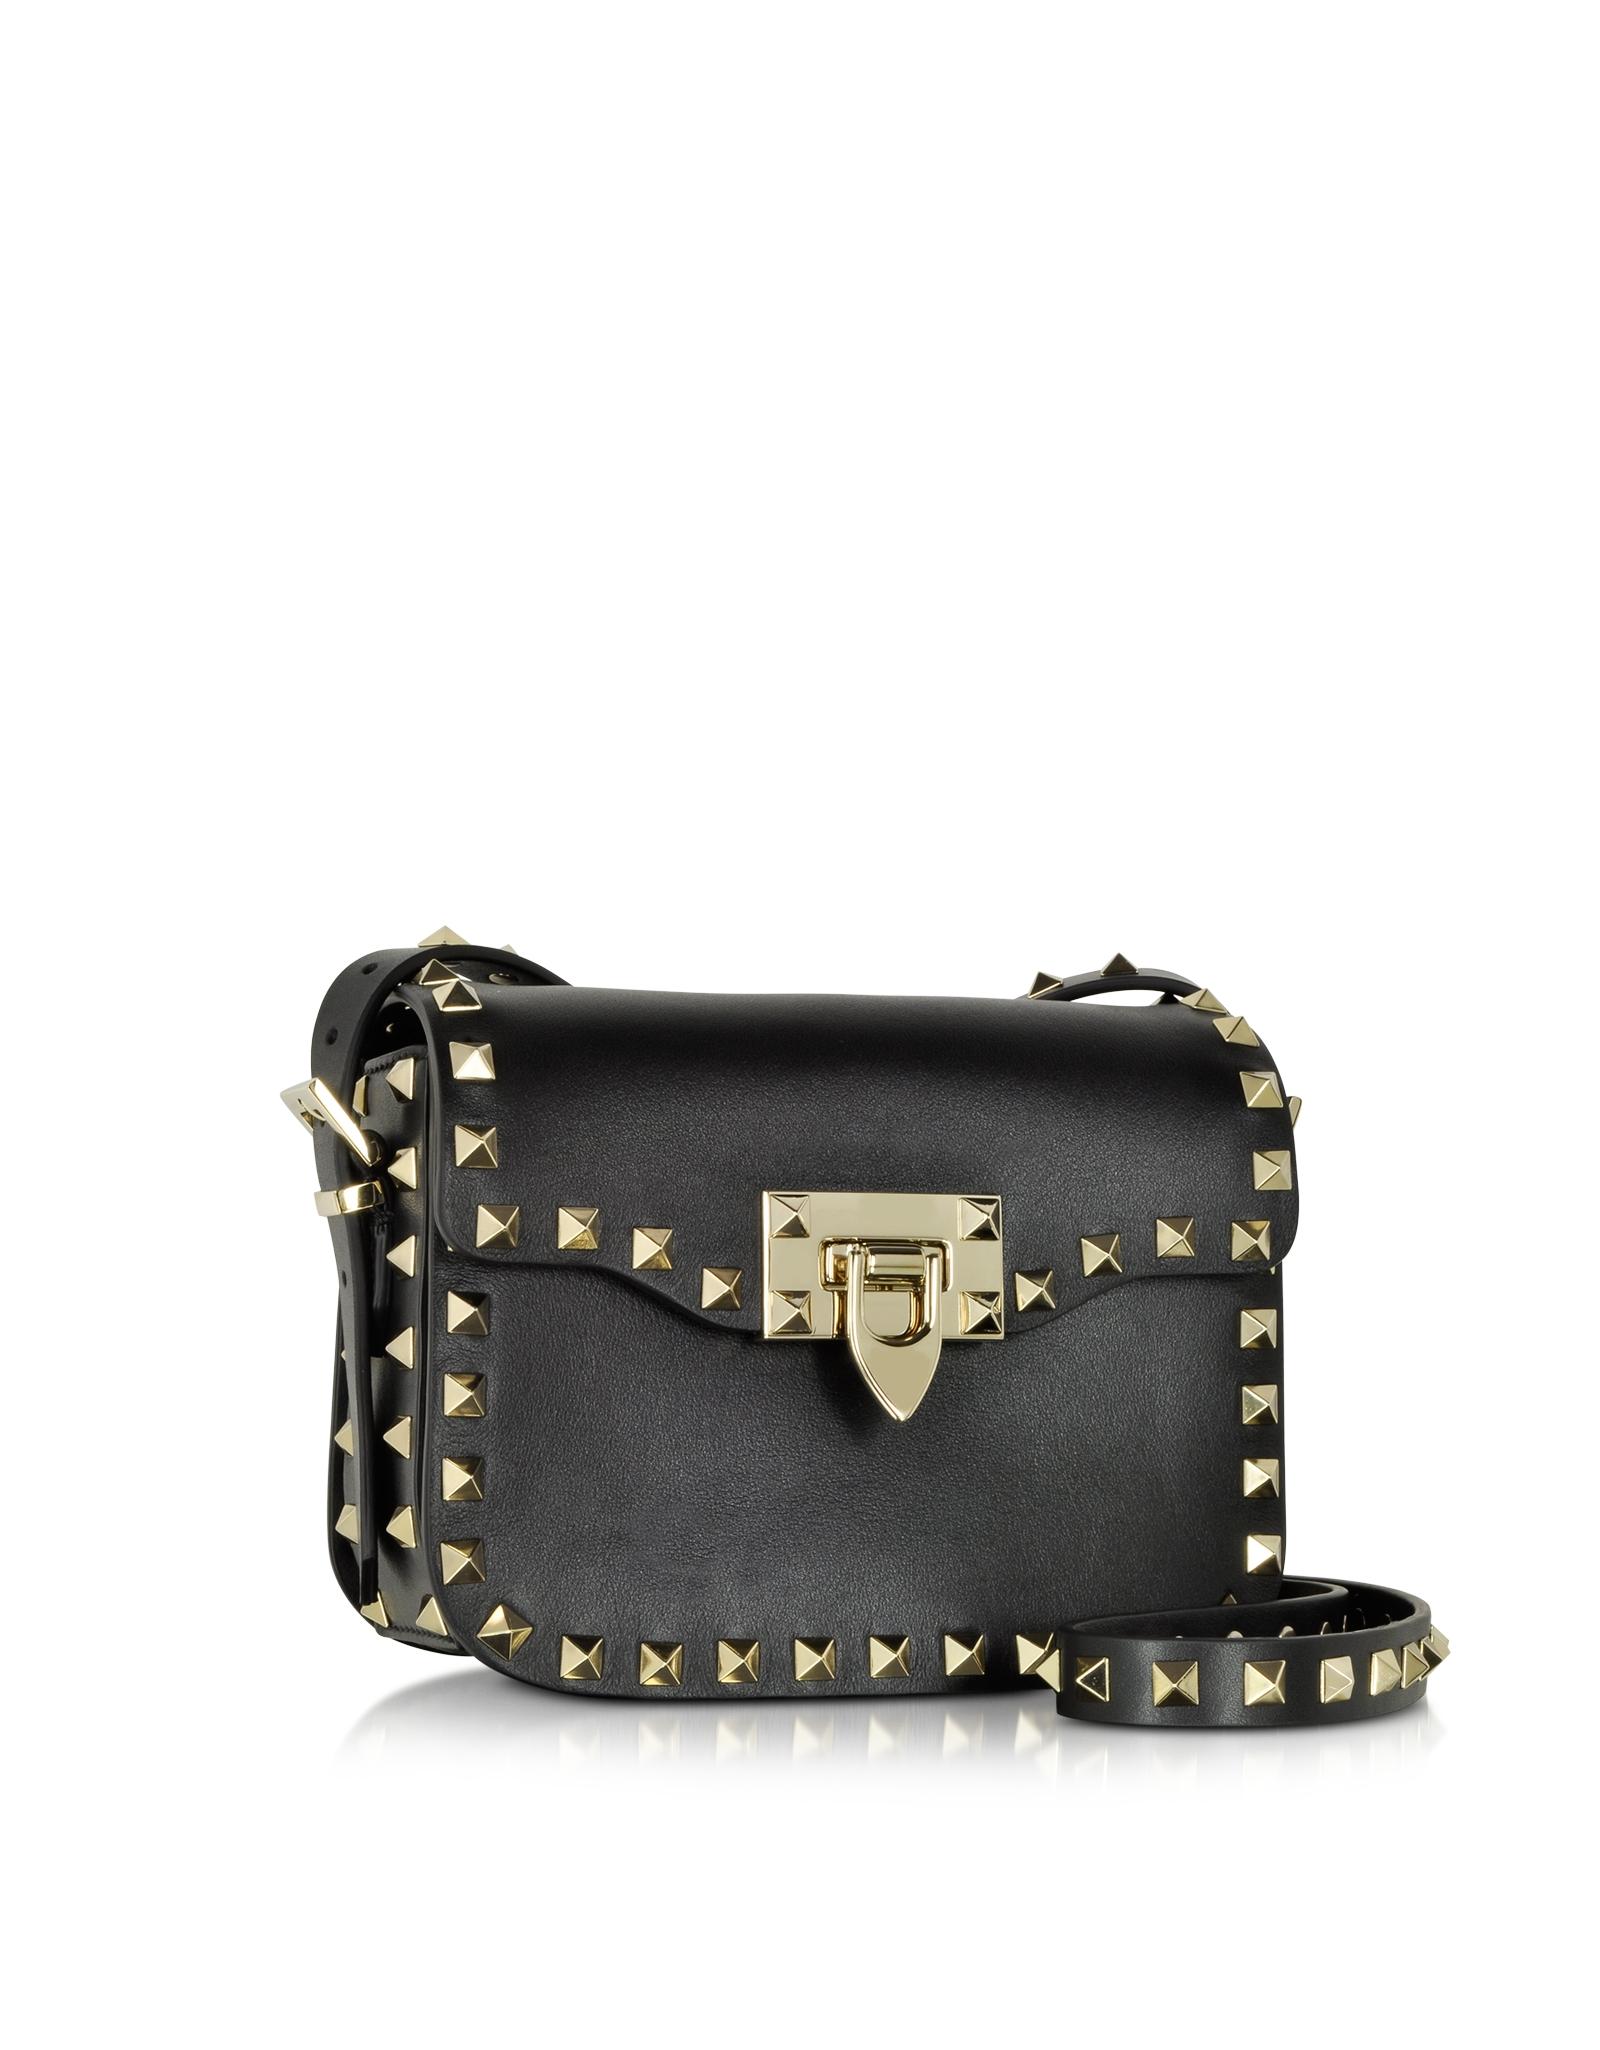 Valentino Rockstud Black Leather Small Shoulder Bag Lyst